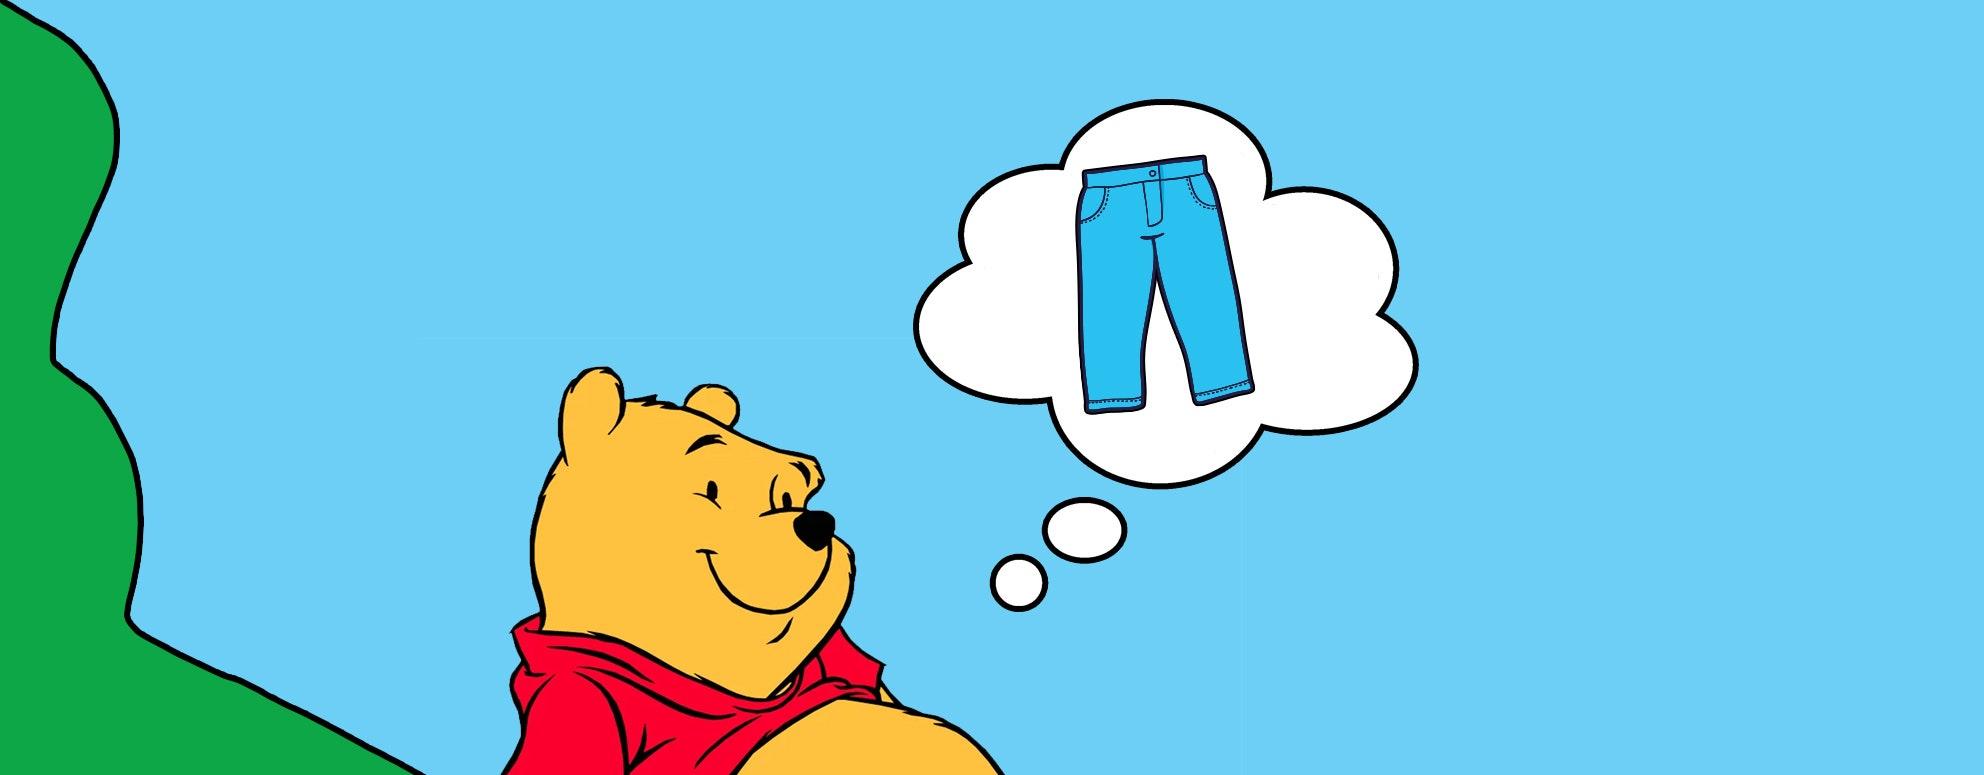 Winnie the poo naked